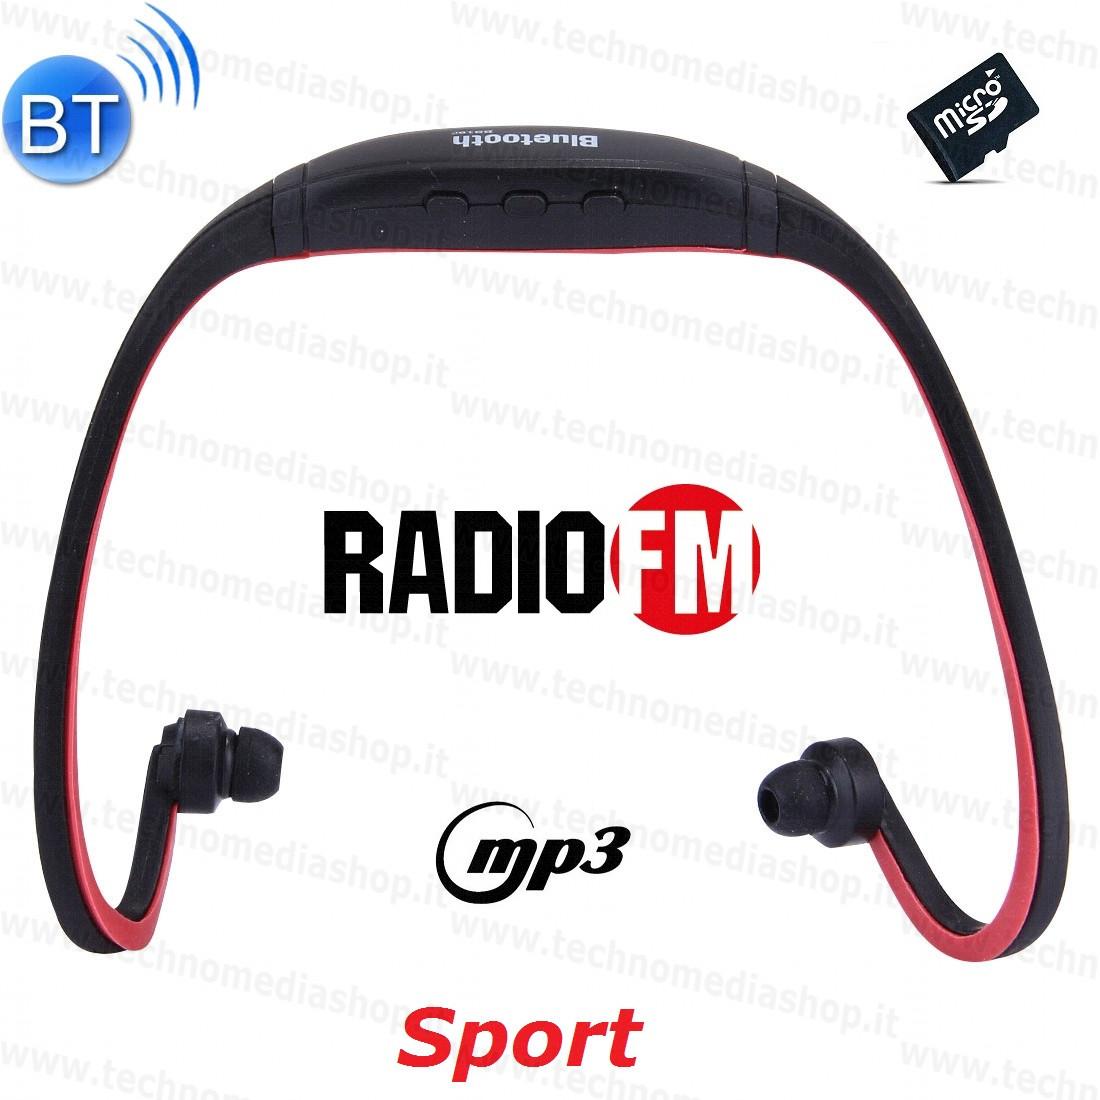 Cuffie auricolari Sport Bluetooth headphones con ricevitore Radio FM mp3  player microSD vivavoce telefonate 70f307bca6bb